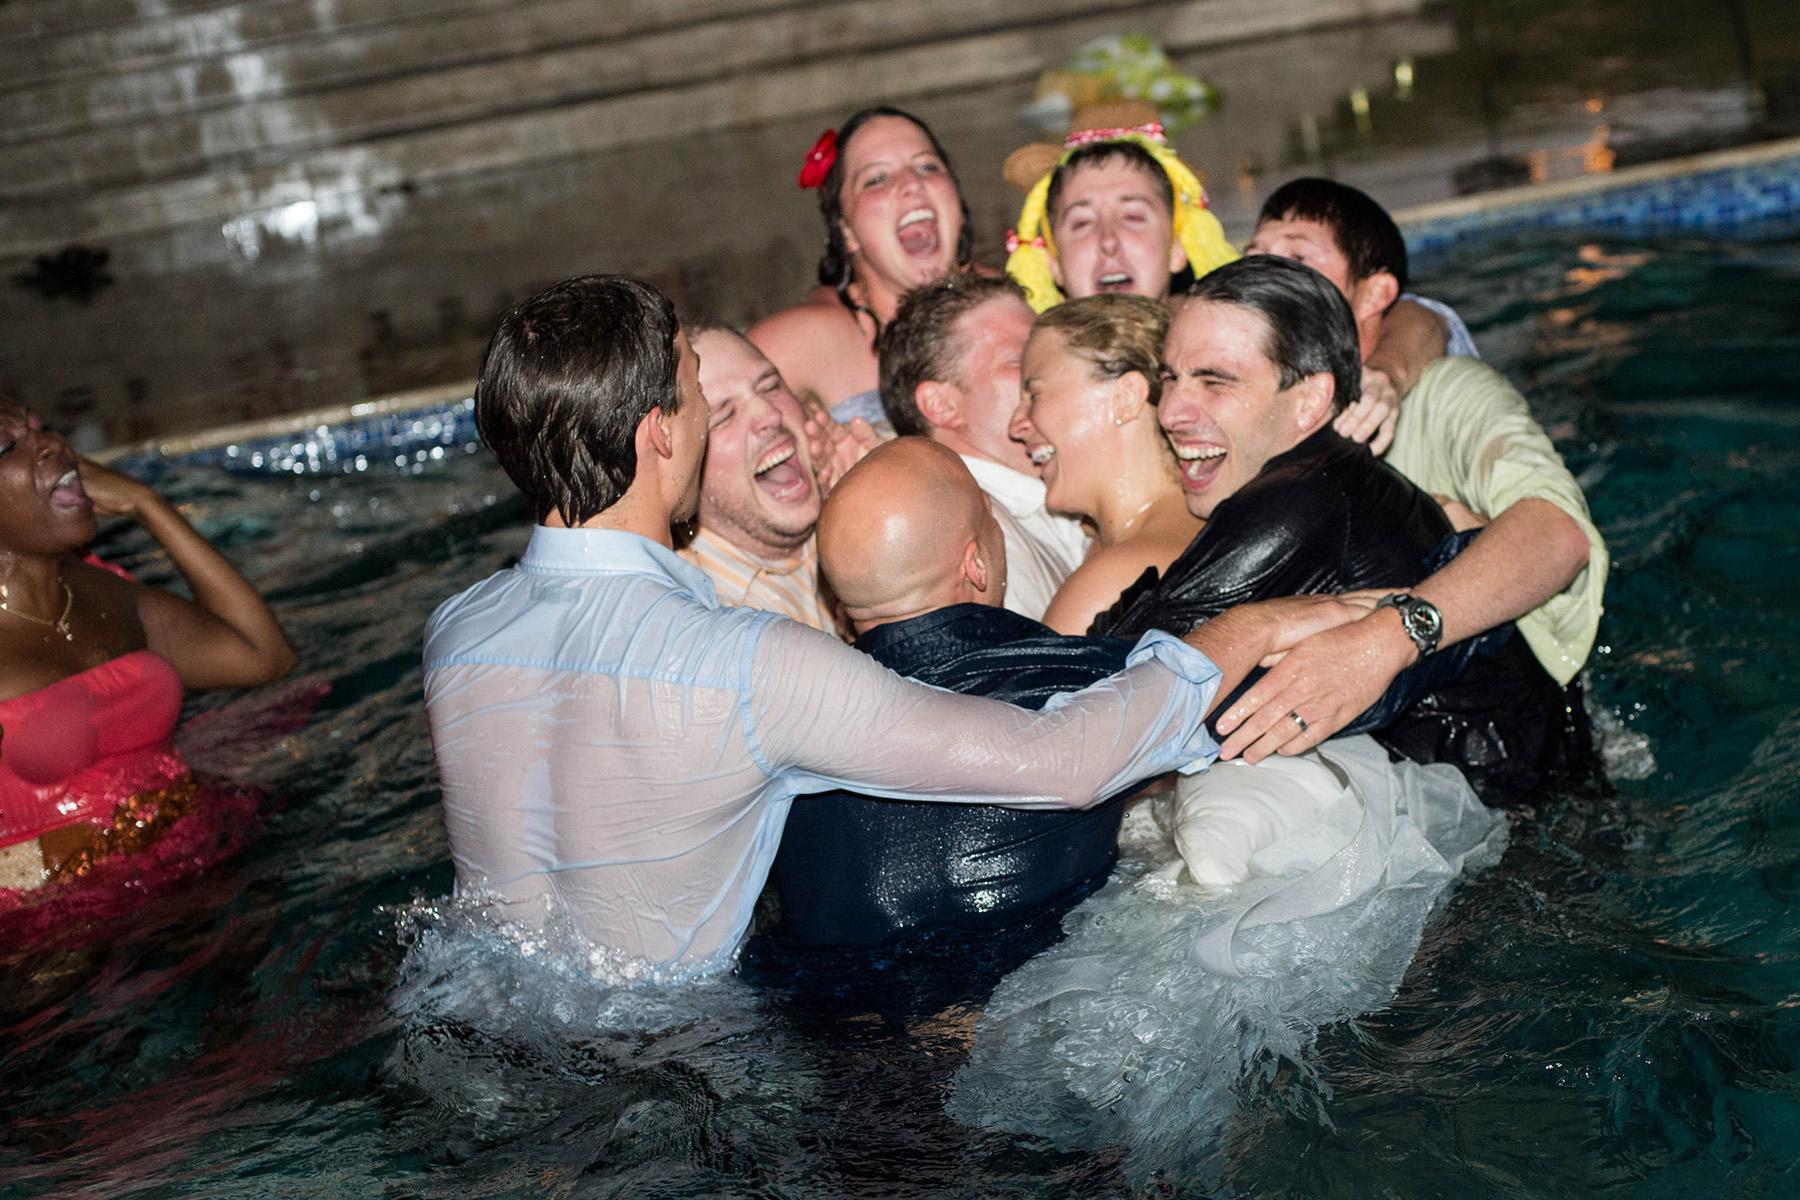 denver_wedding_photojournalist0229.jpg